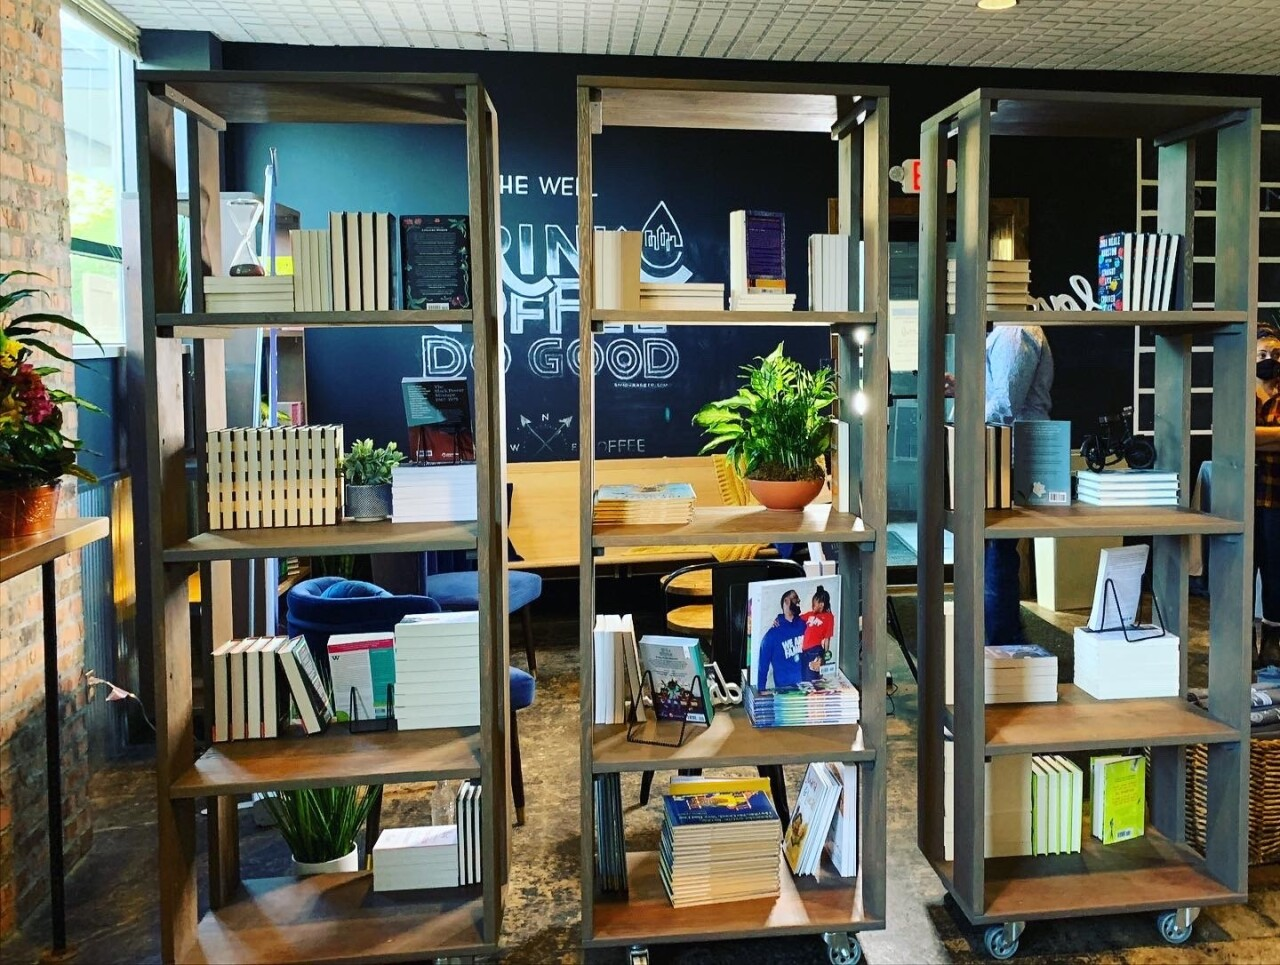 Elizabeth's Bookshop and We